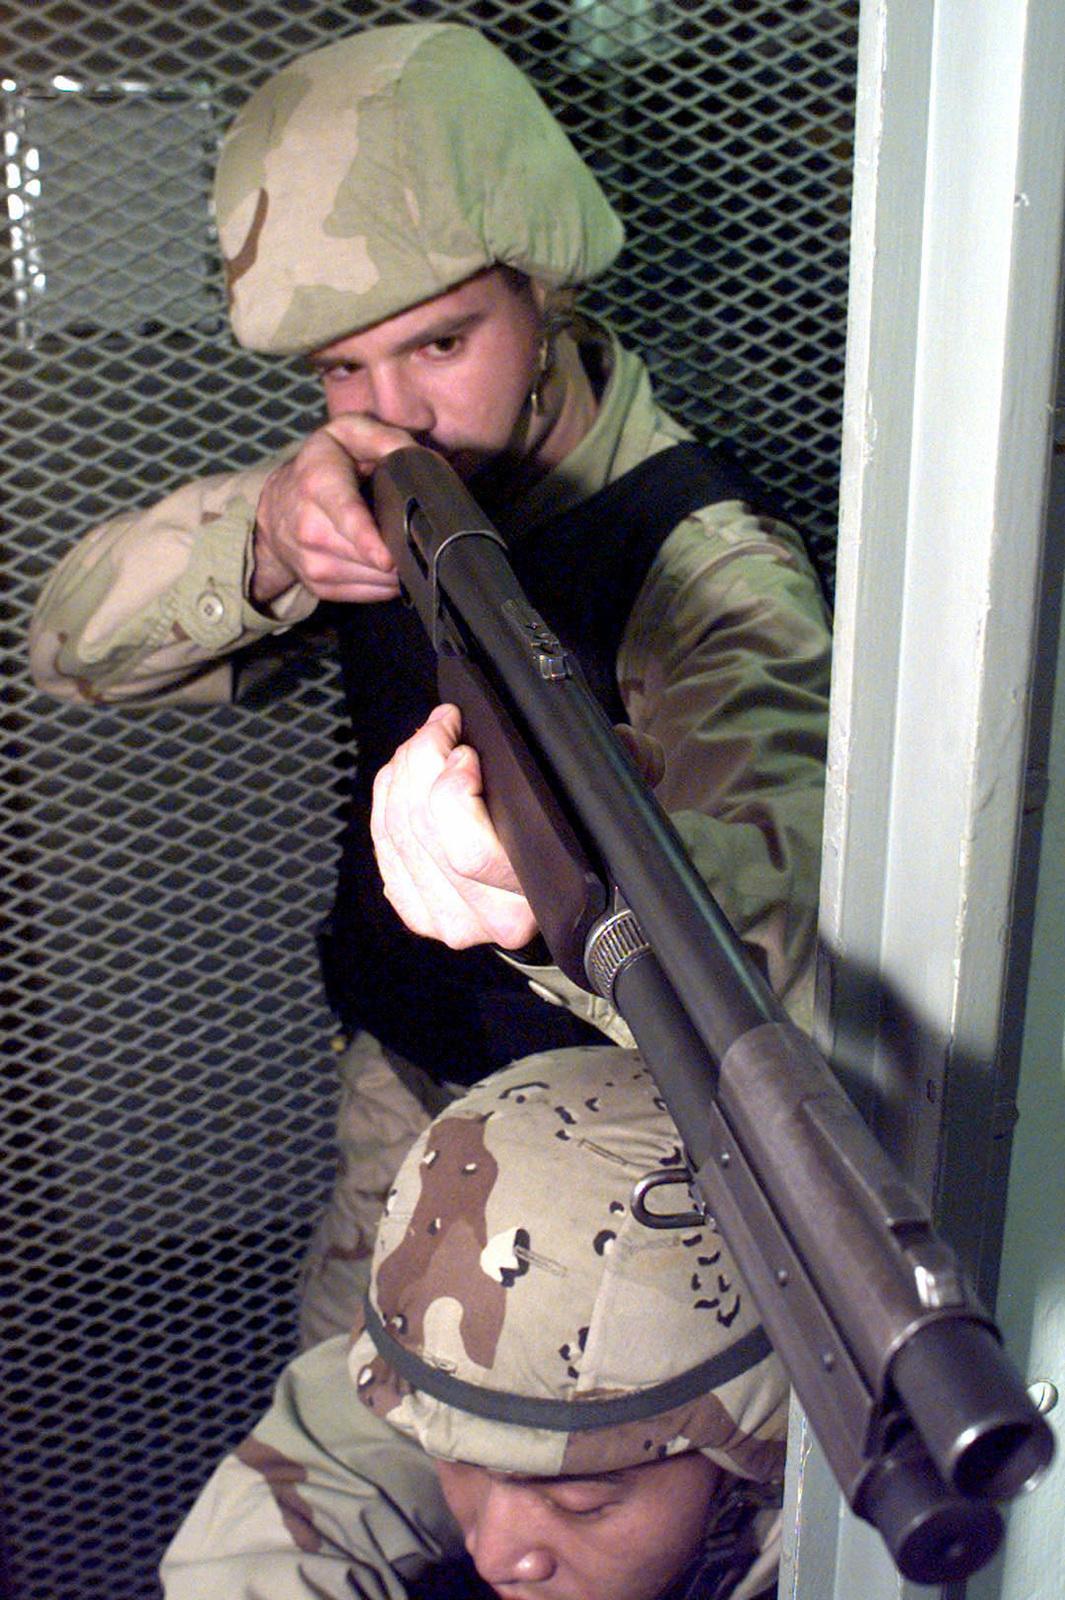 US Marine Corporal David Lampron (Top) readies a 12 gauge shotgun